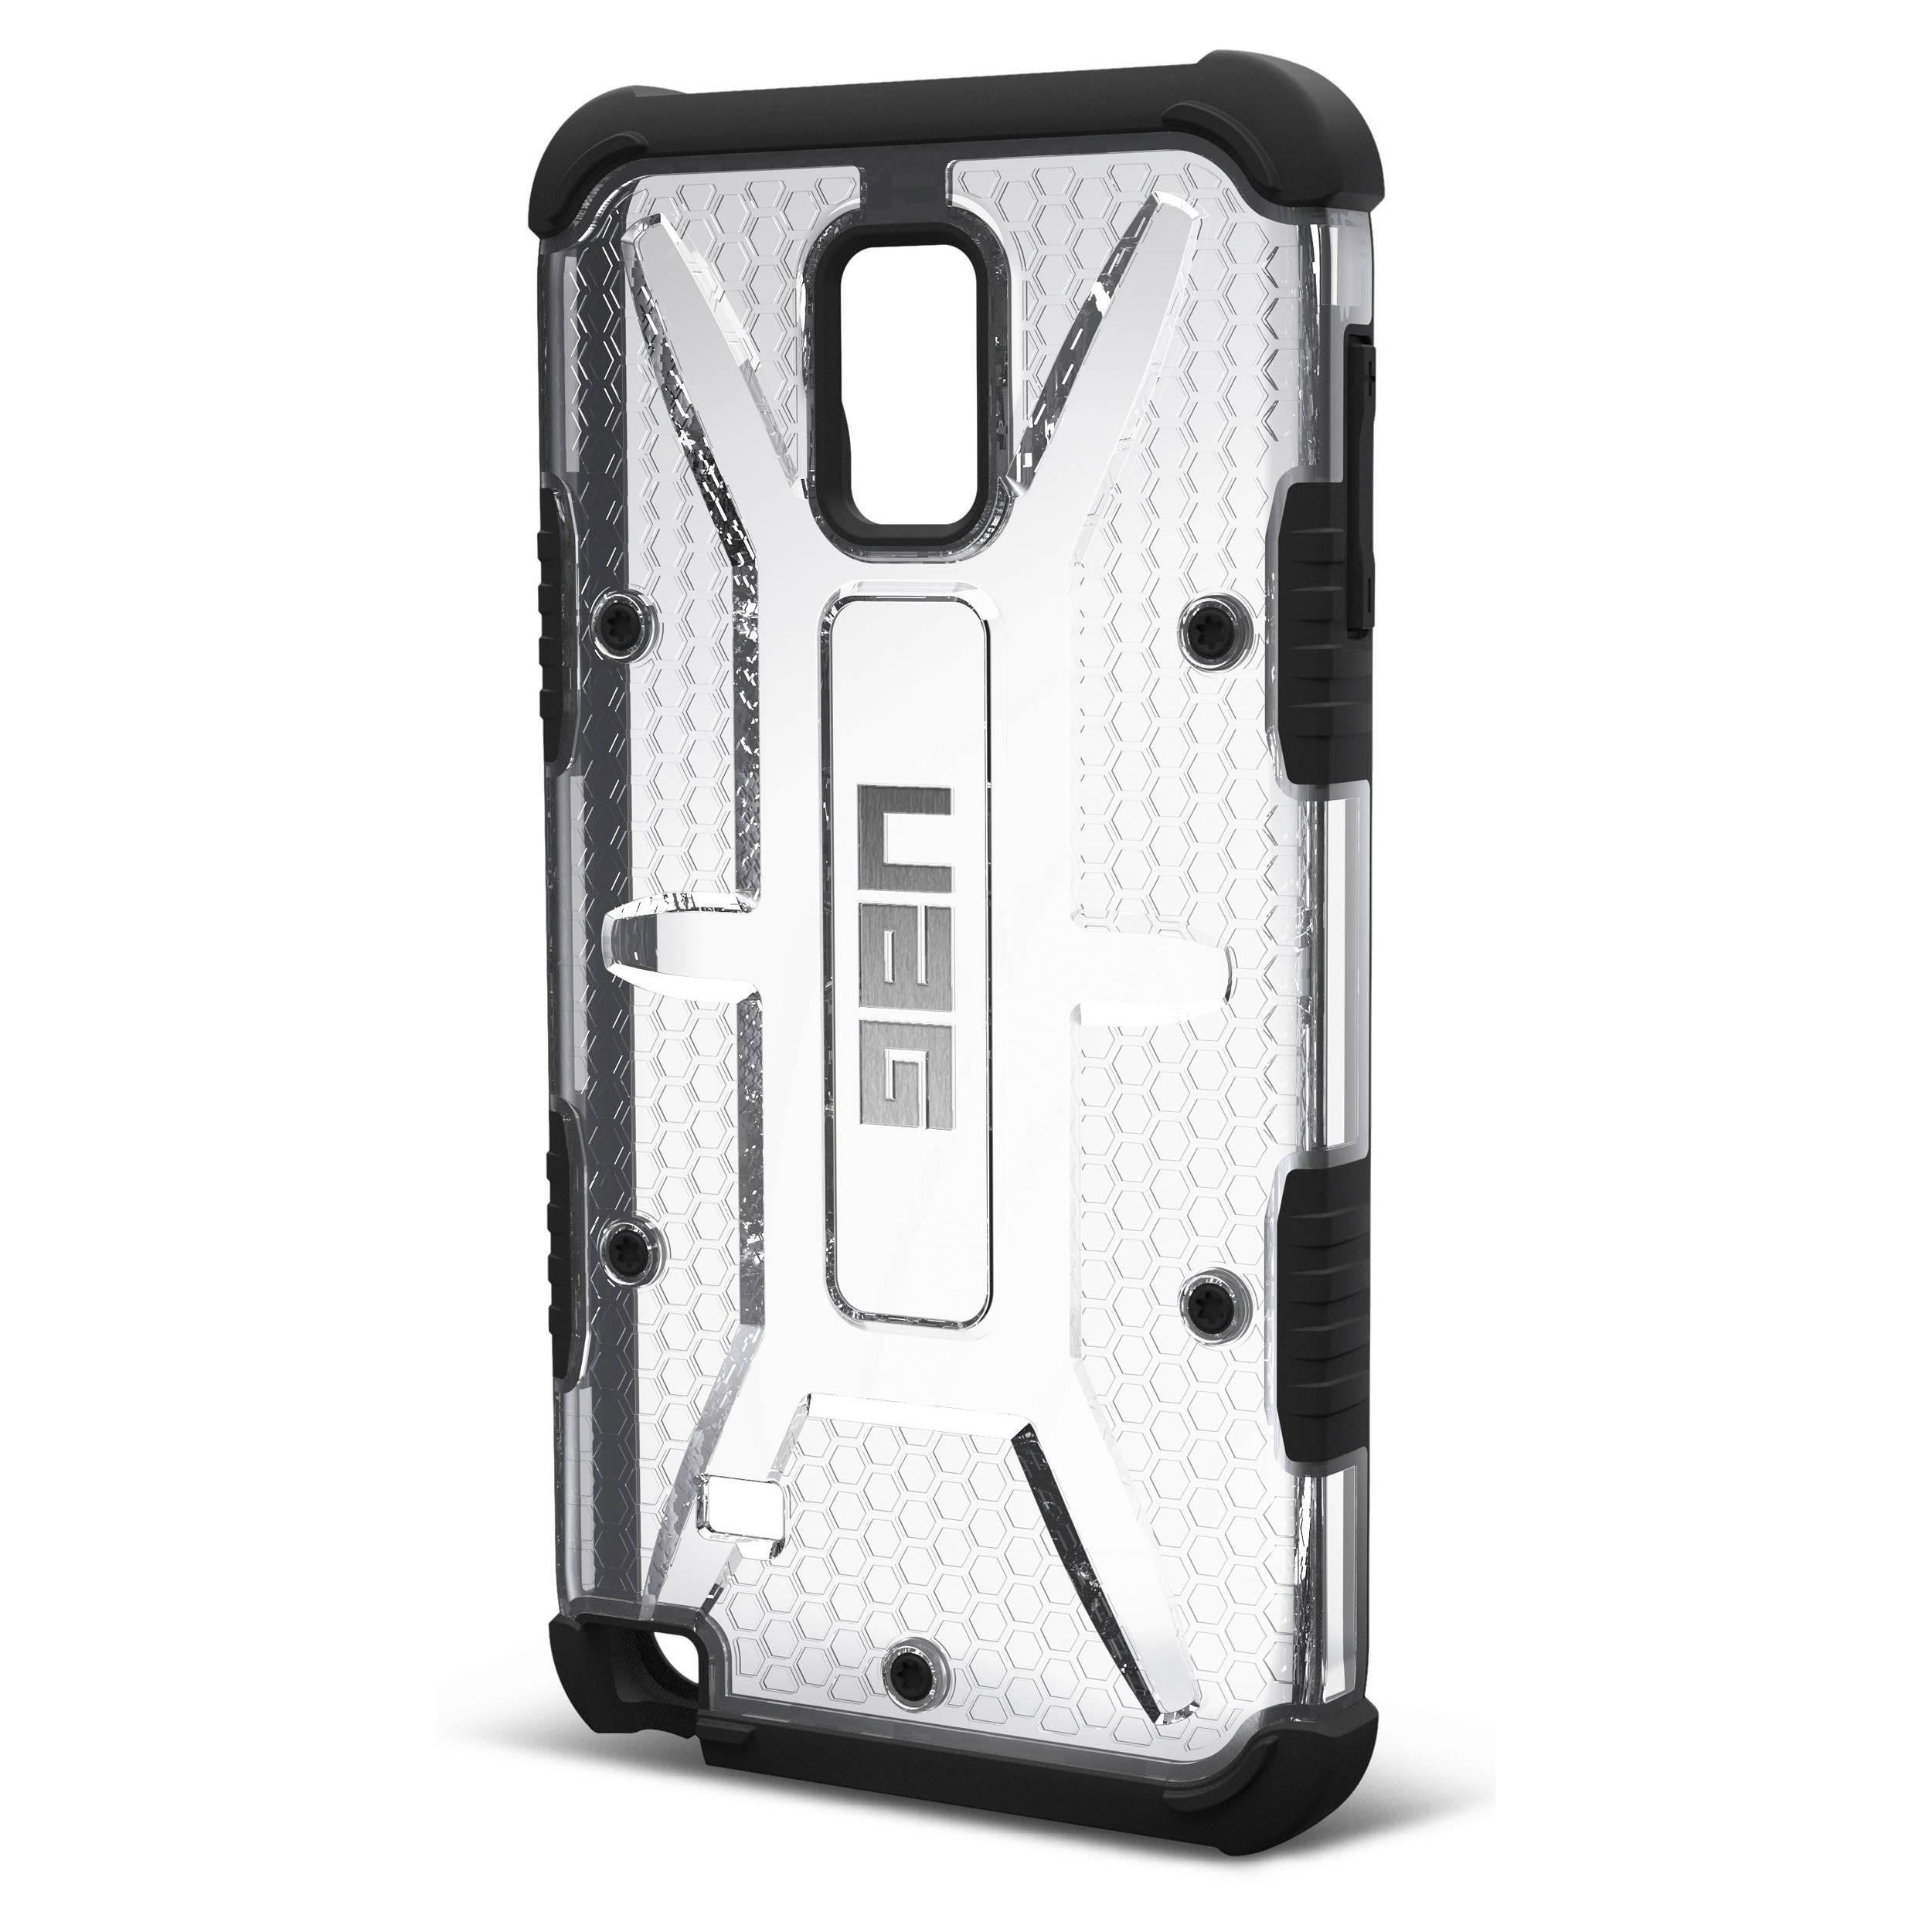 info for bc9d2 3793a Urban Armor Gear Composite Case for Galaxy Note 4 (Maverick)